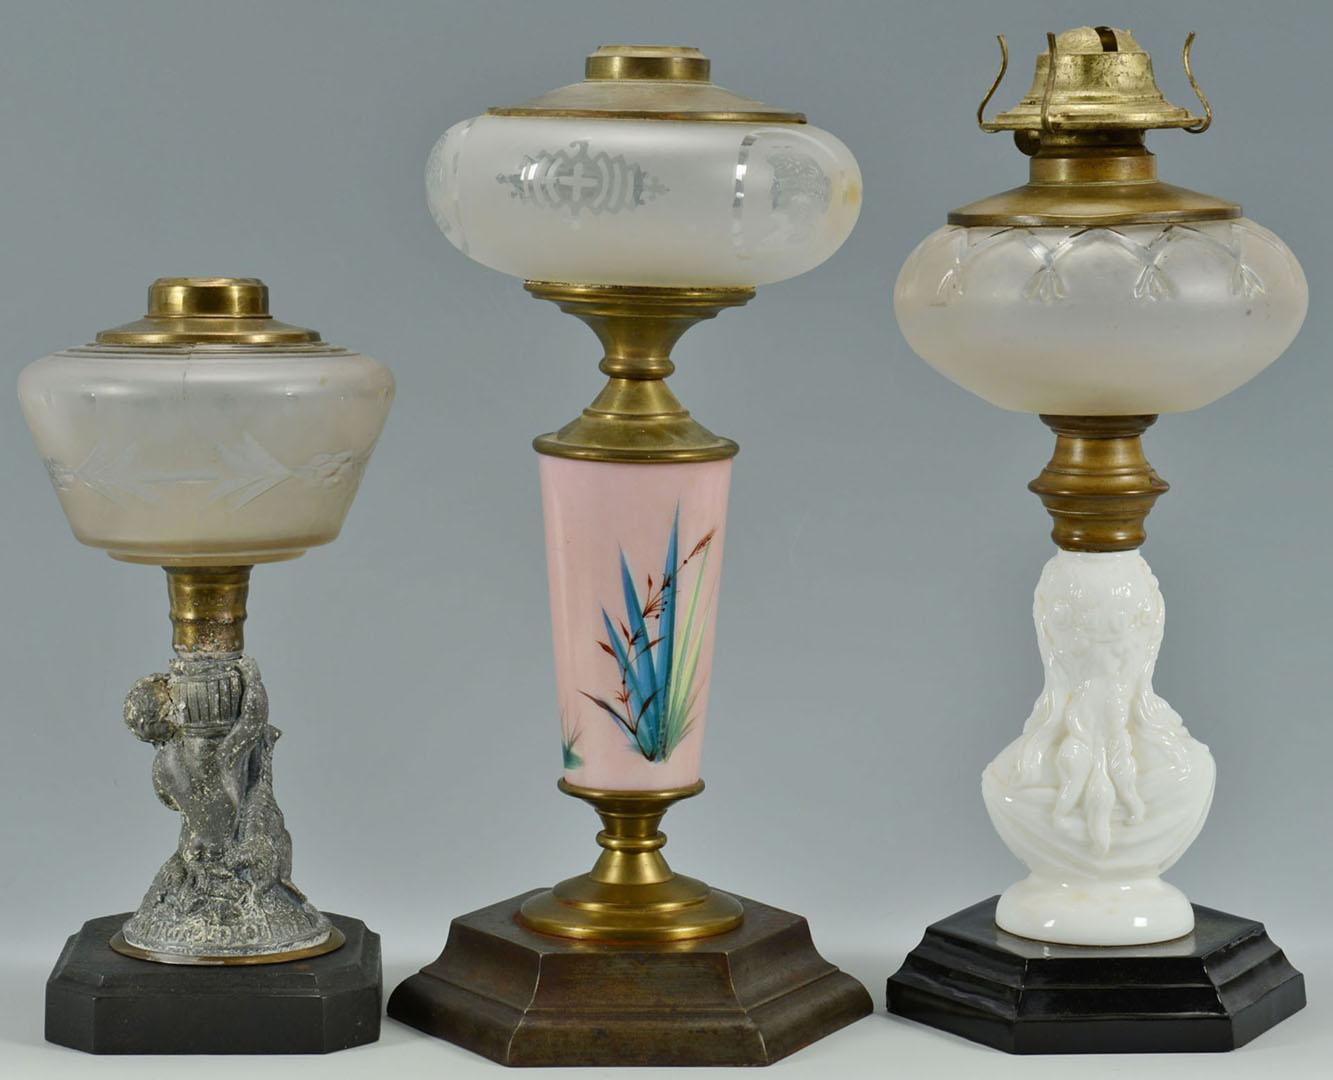 Lot 2872320: 3 Classical Oil Lamps